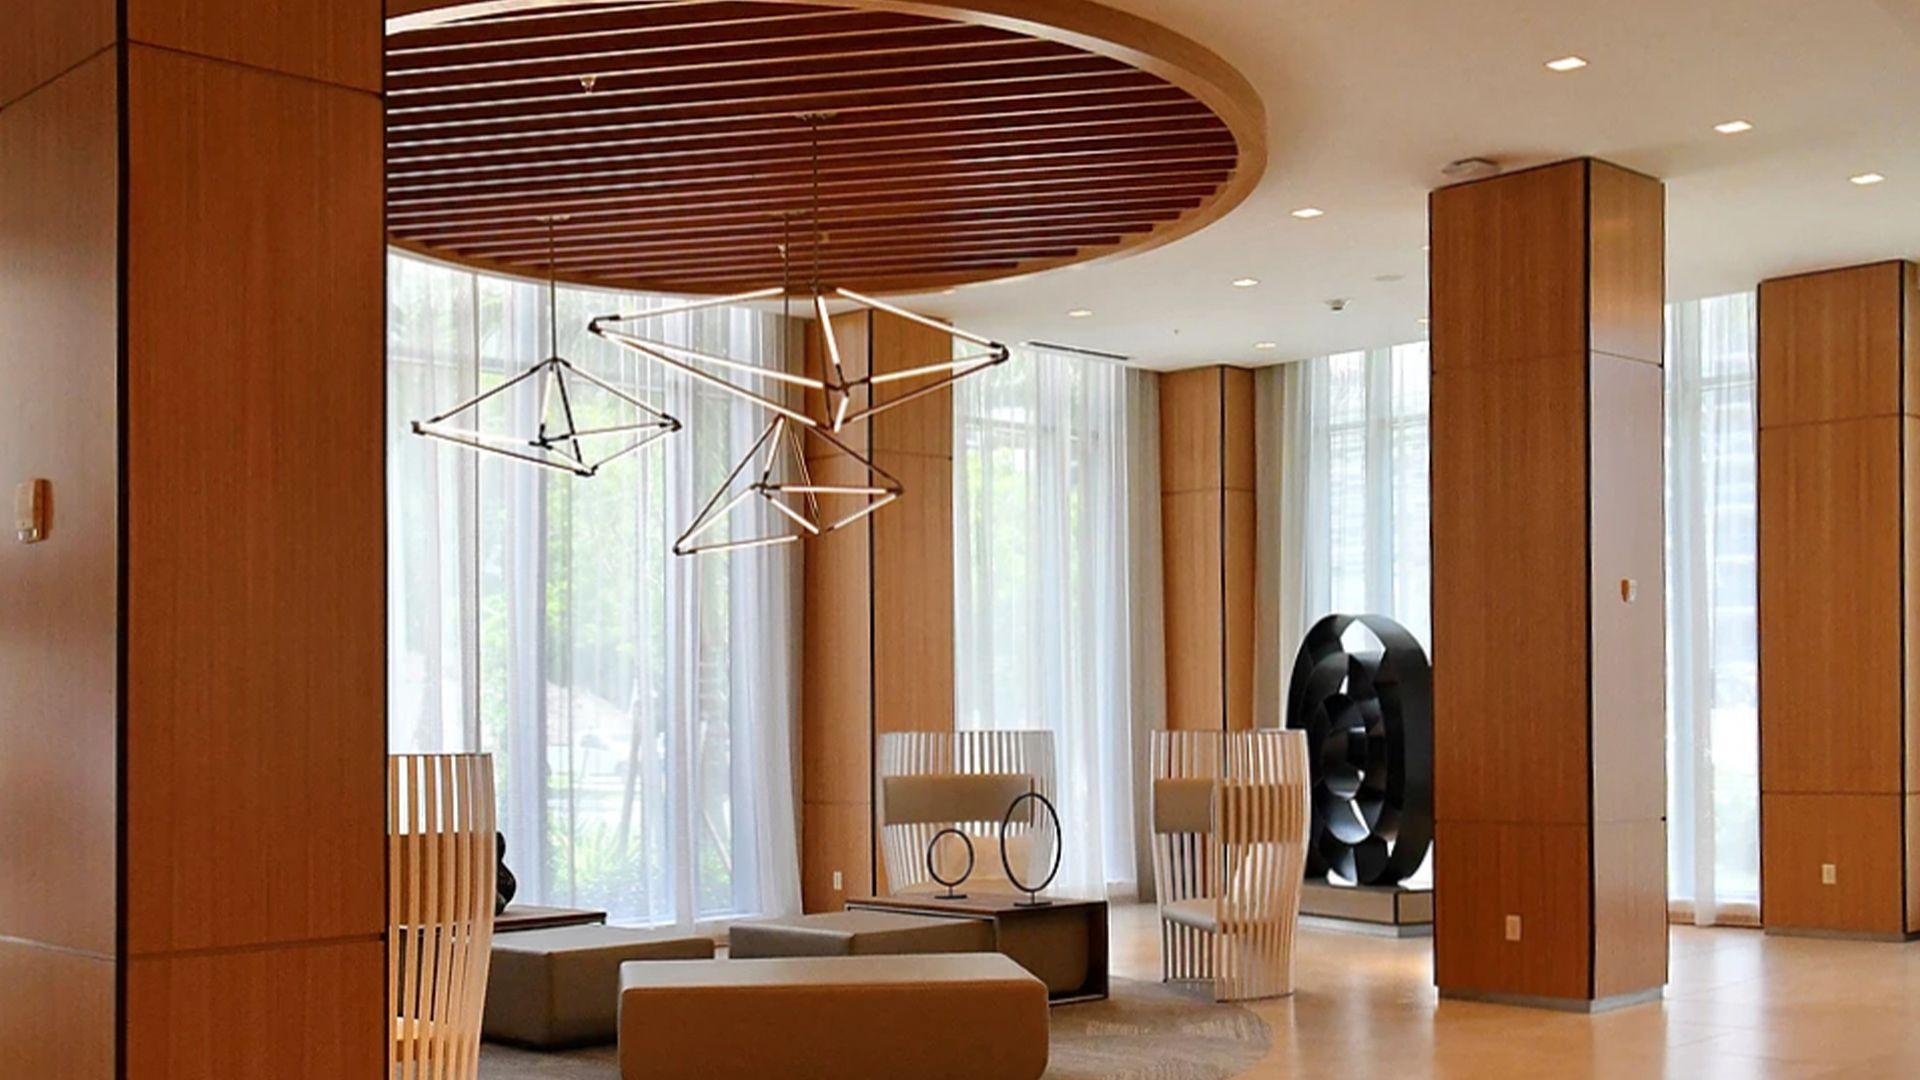 wall panels, wood paneling, woodworking paneling, prefinished veneer, veneer, architectural panel, flexible wood, decorative wood, interior design